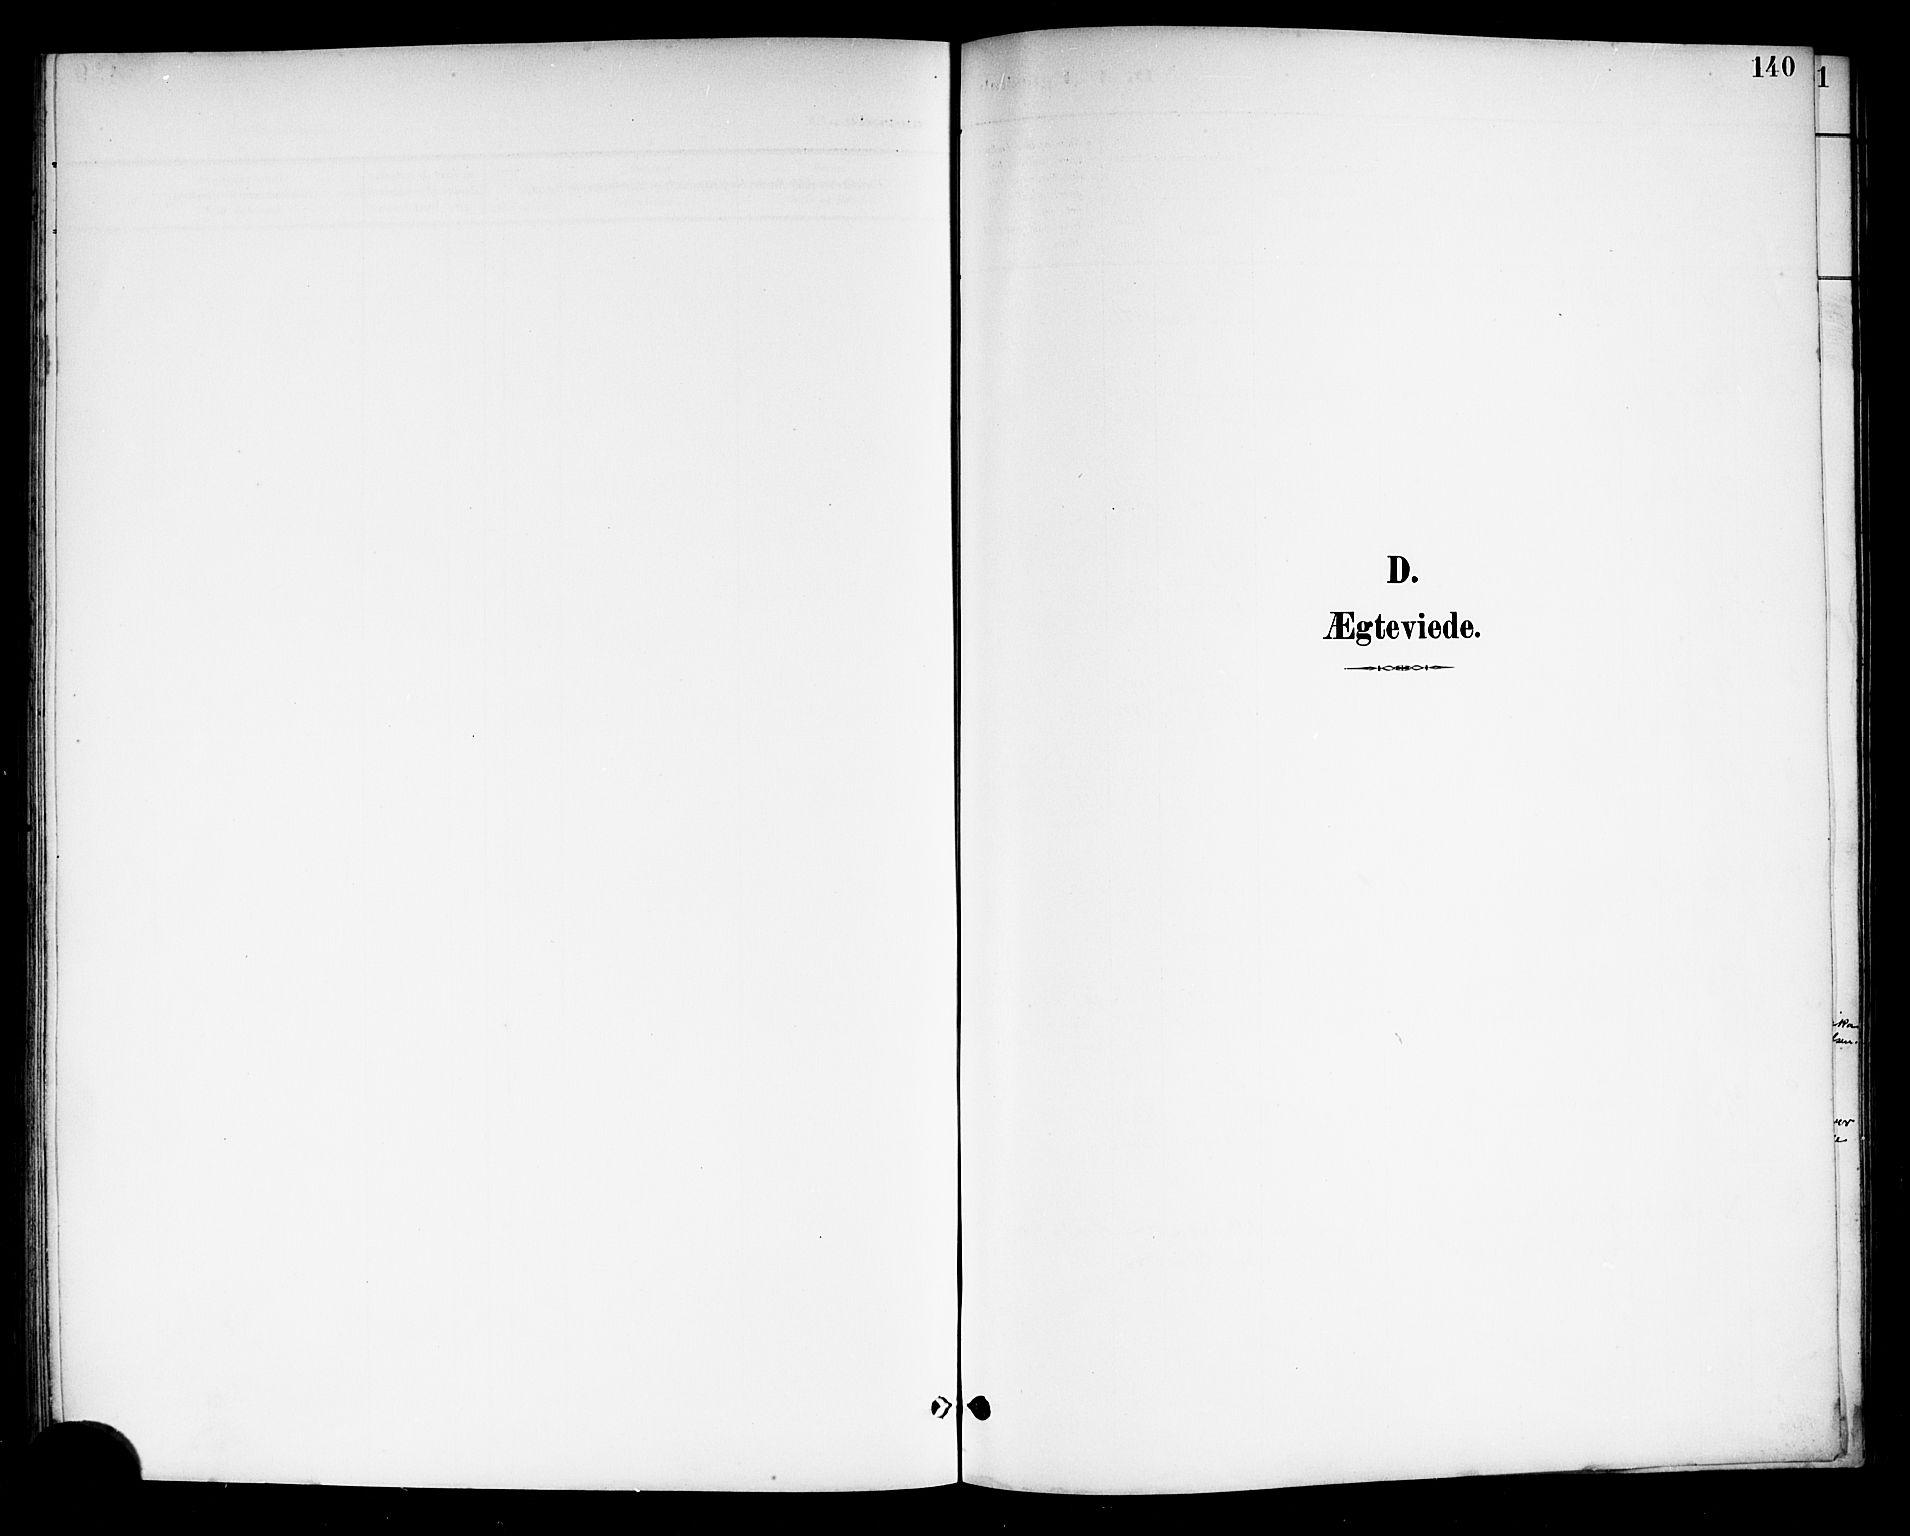 SAKO, Drangedal kirkebøker, G/Gb/L0002: Parish register (copy) no. II 2, 1895-1918, p. 140